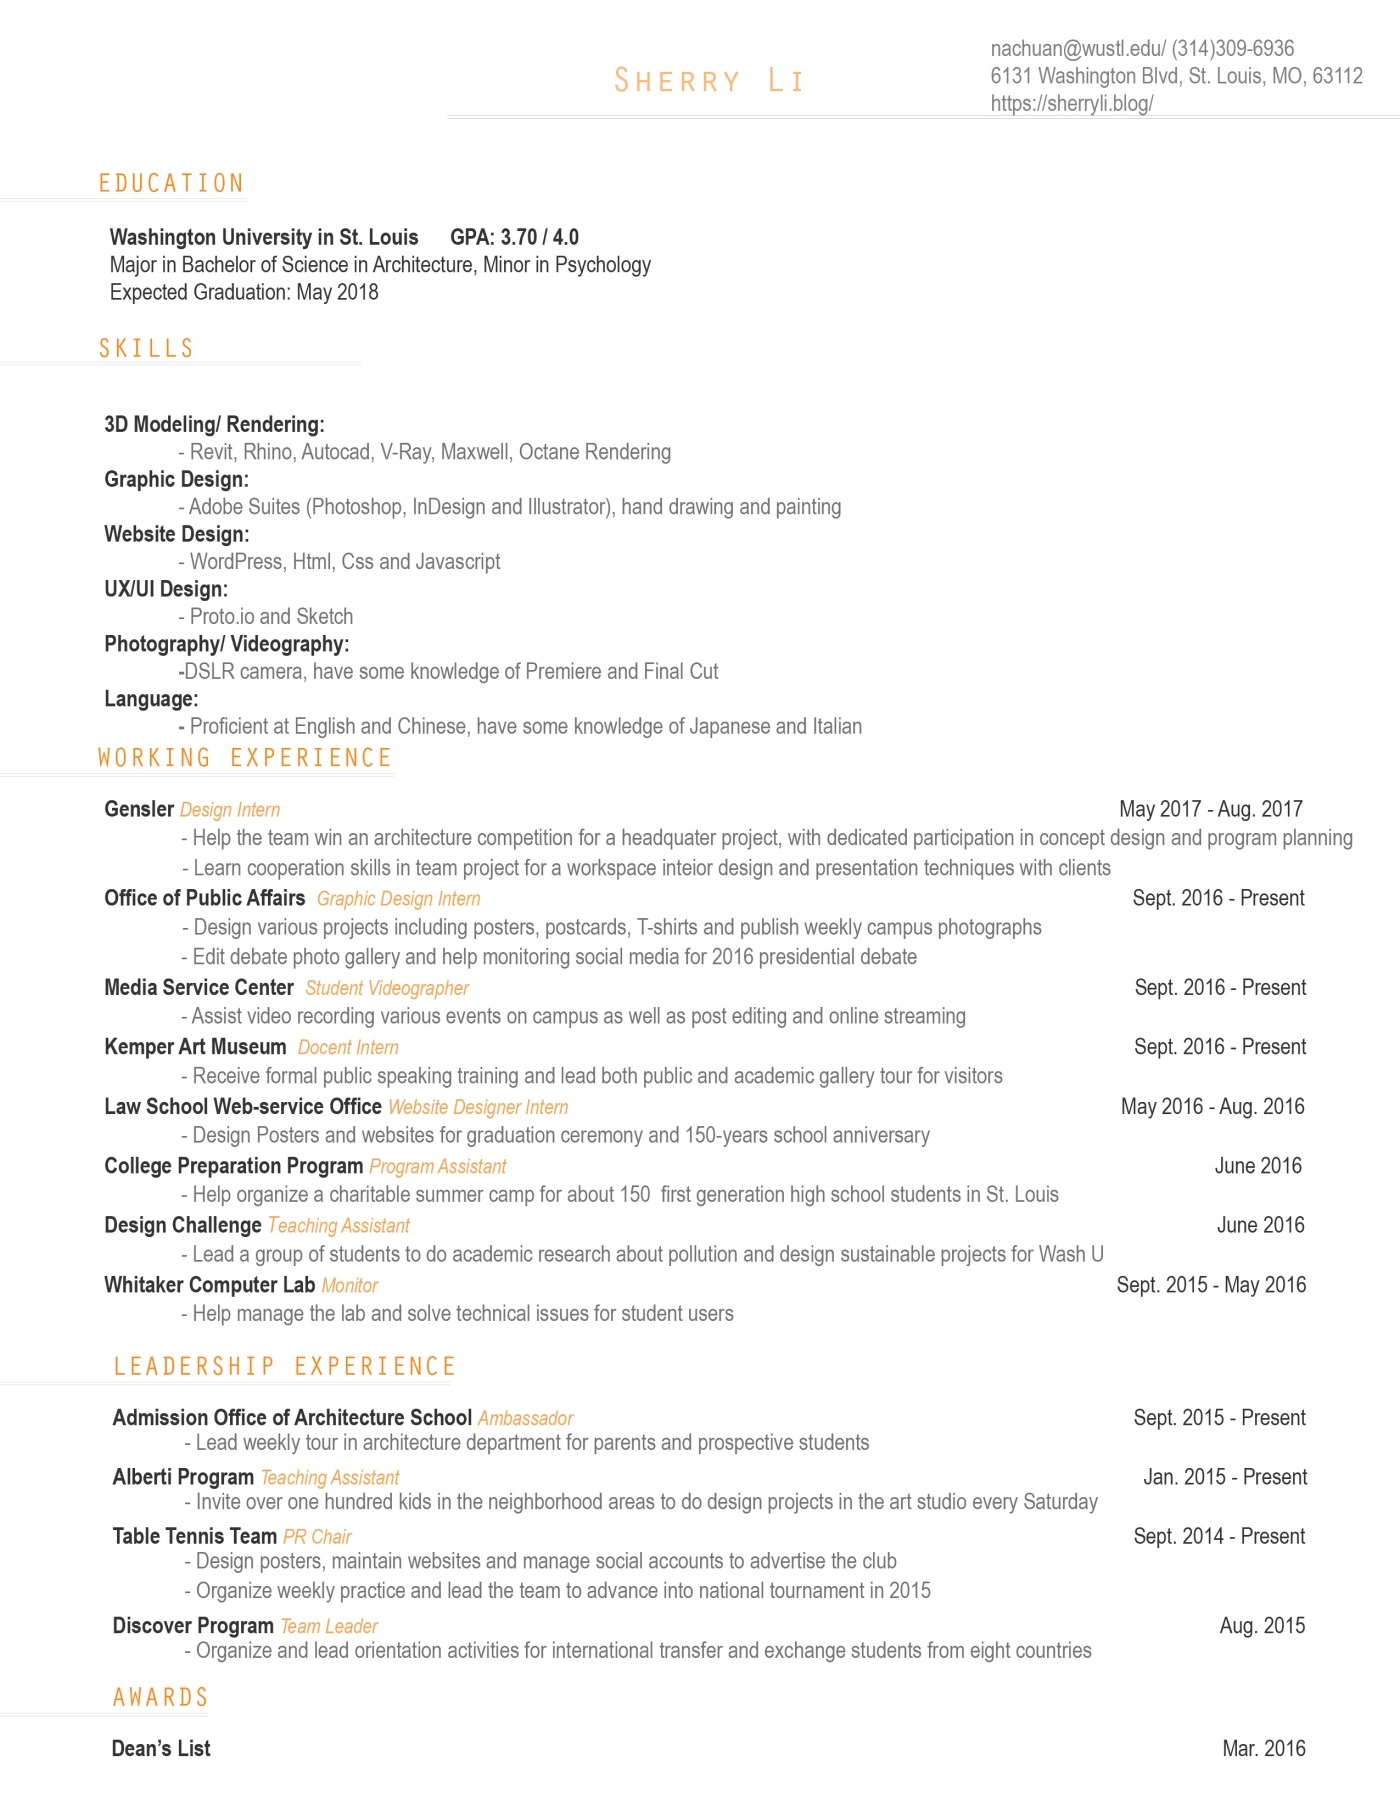 Resume_Sherry Li